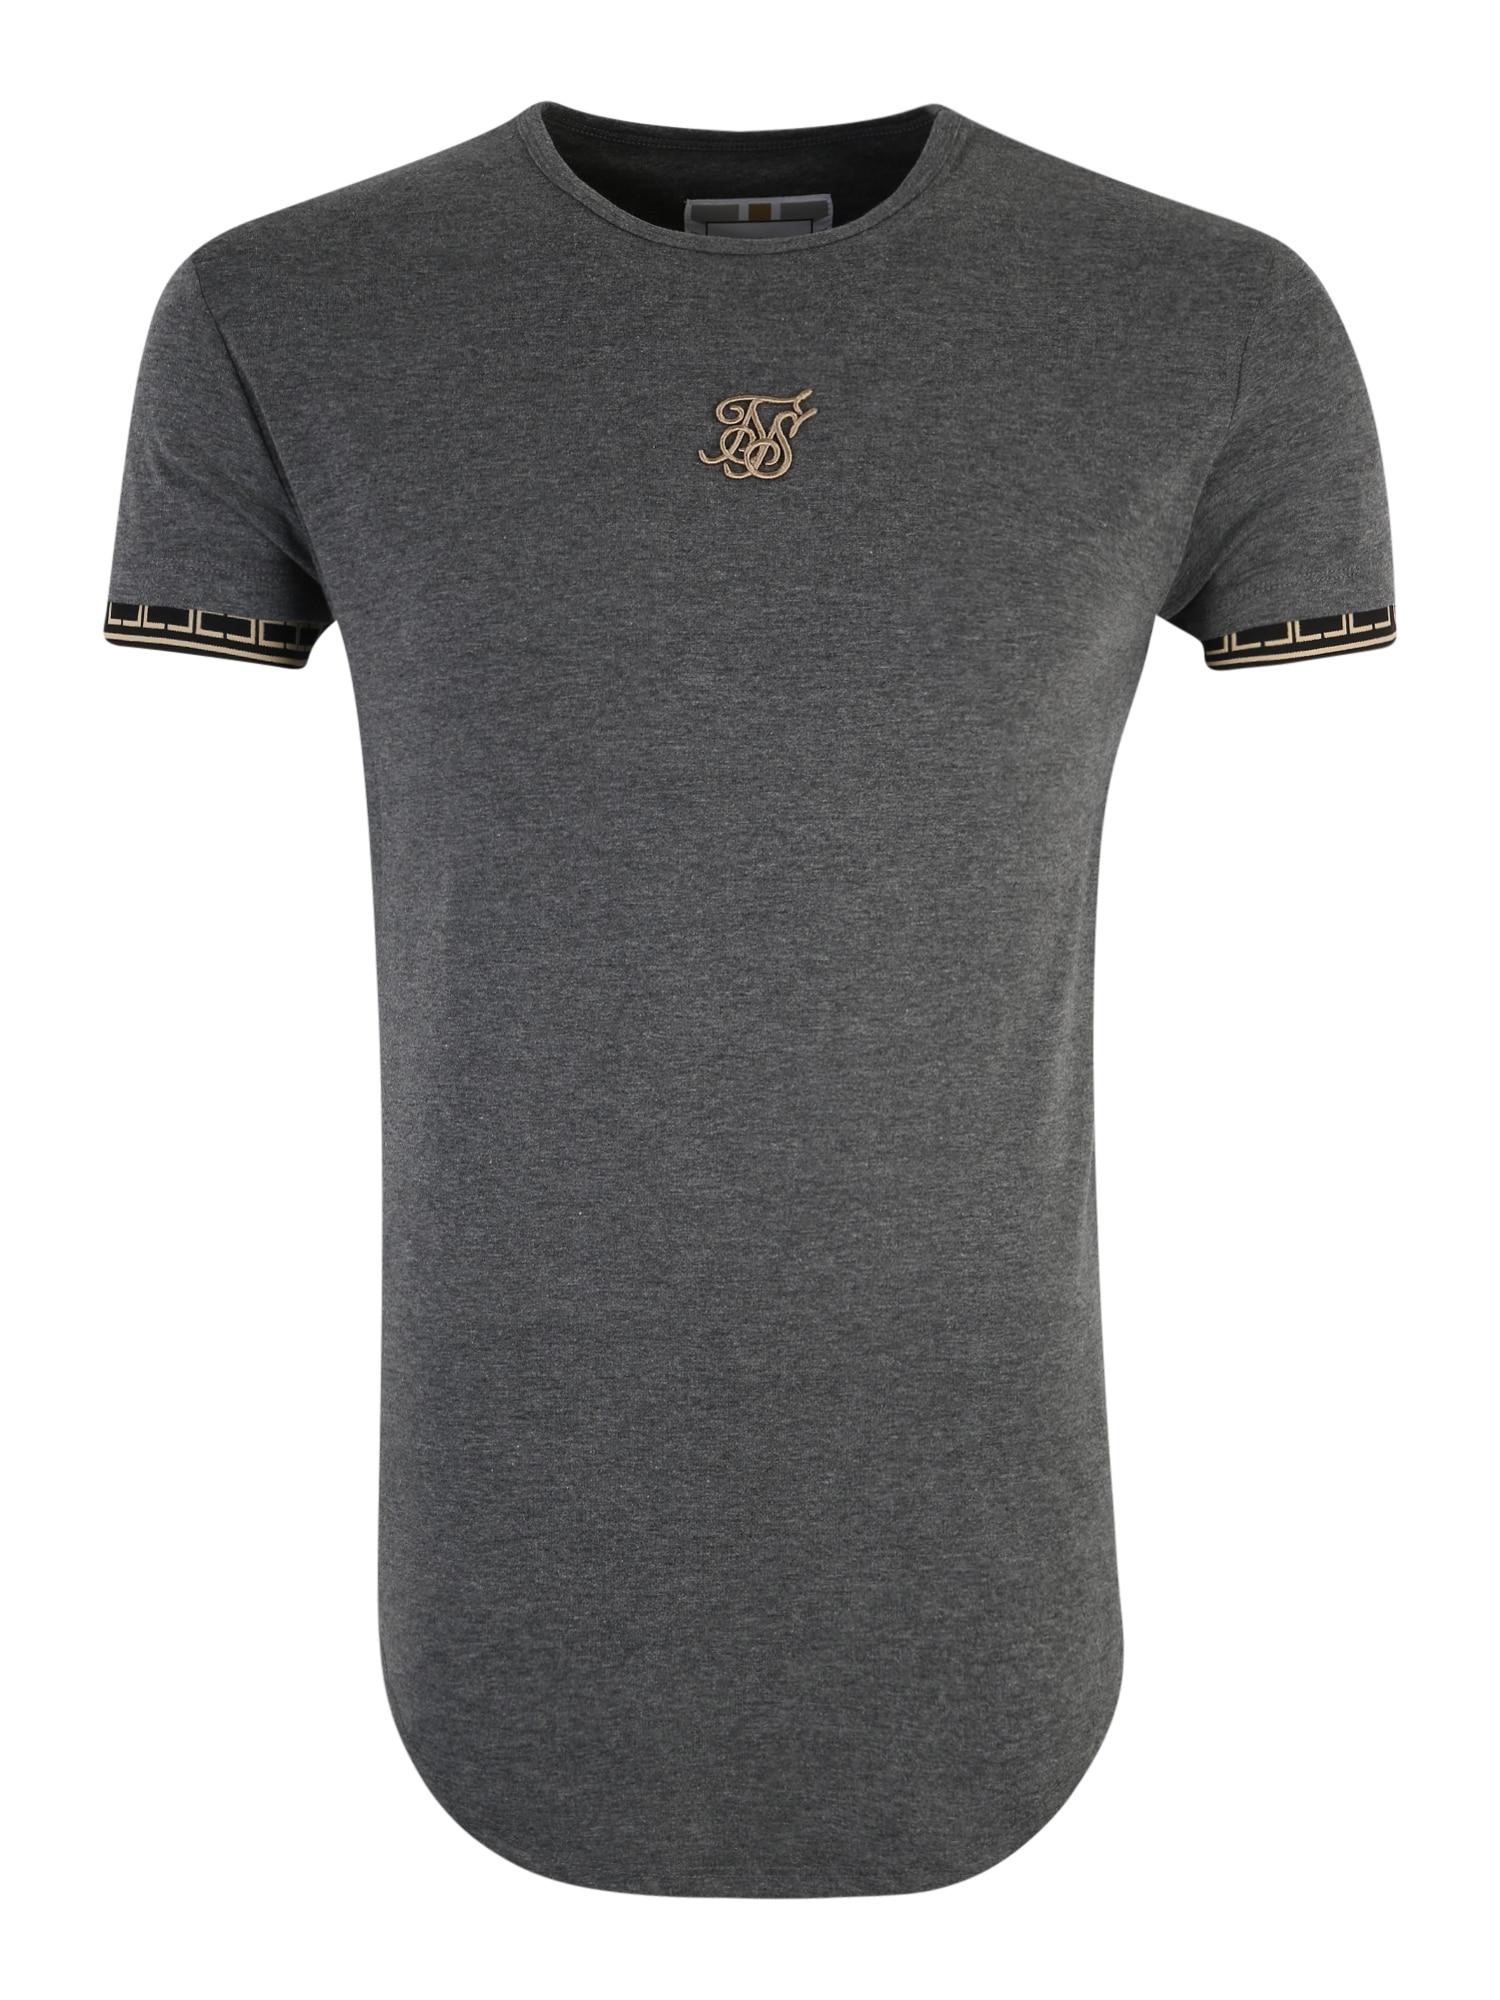 Shirt 'siksilk s/s cartel scope gym tee' | Sportbekleidung > Sportshirts | SikSilk